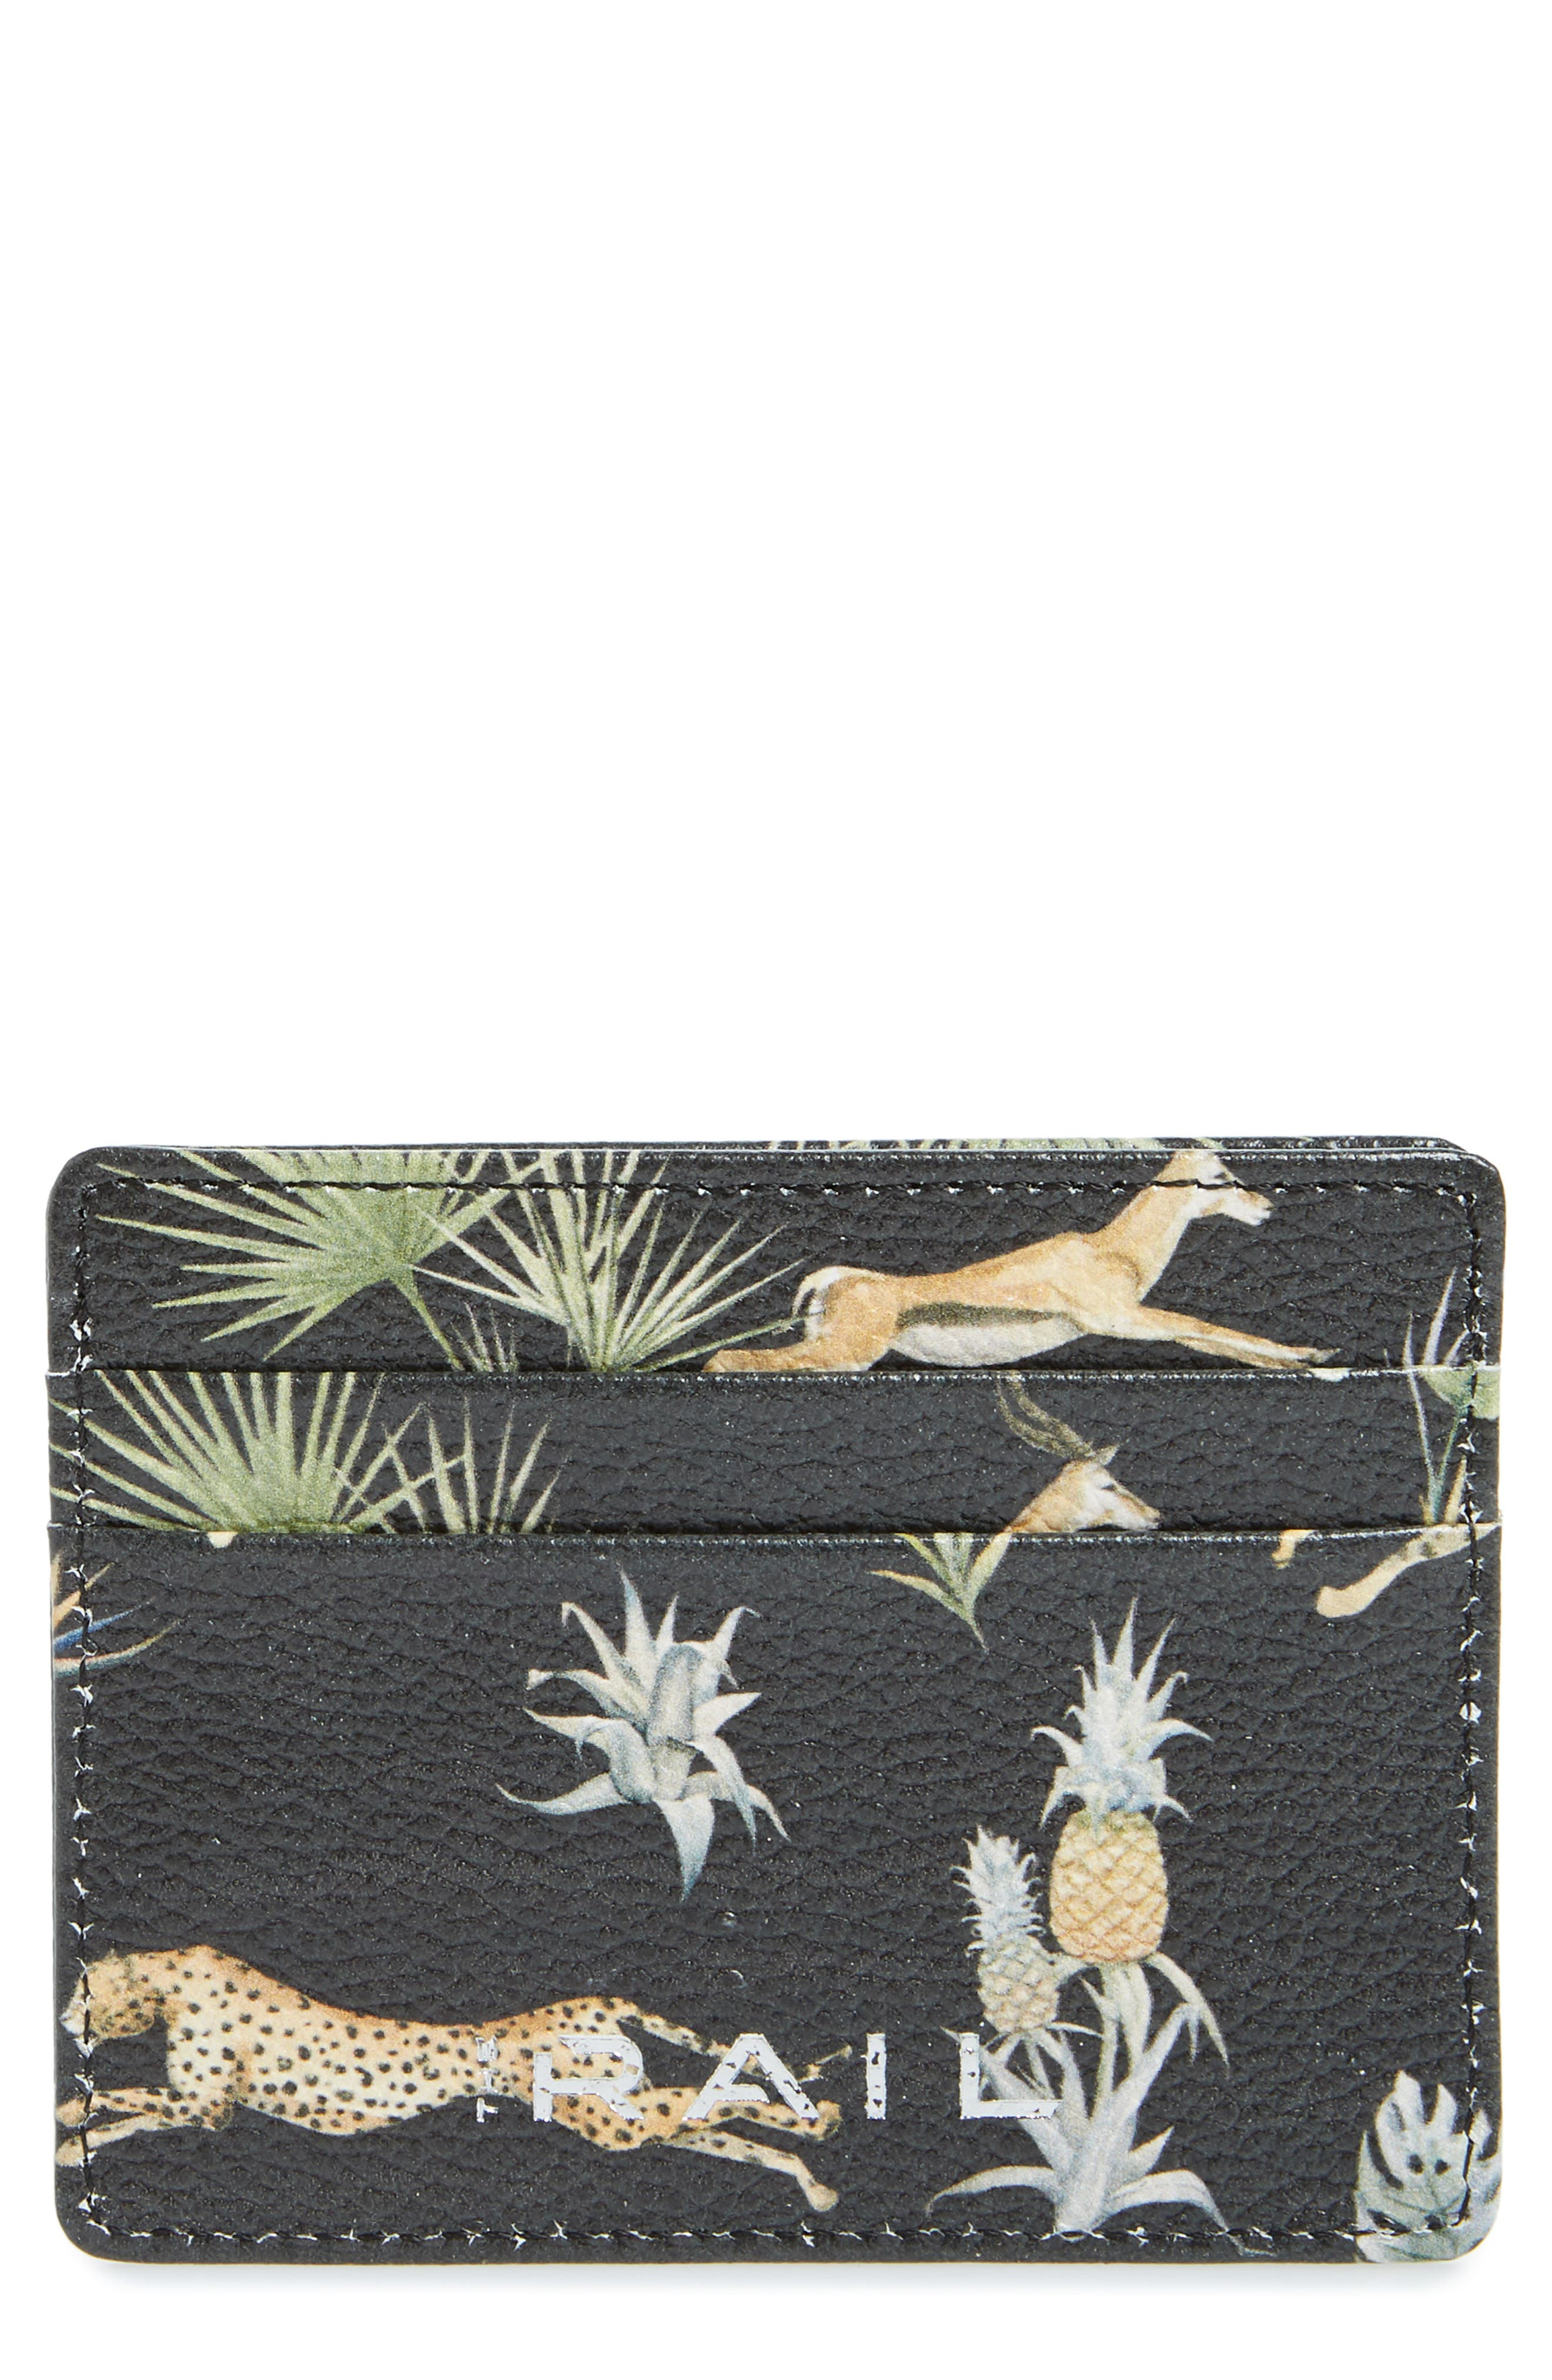 THE RAIL, Jamie Leather Card Case, Main thumbnail 1, color, BLACK CHEETAH FLORAL PRINT